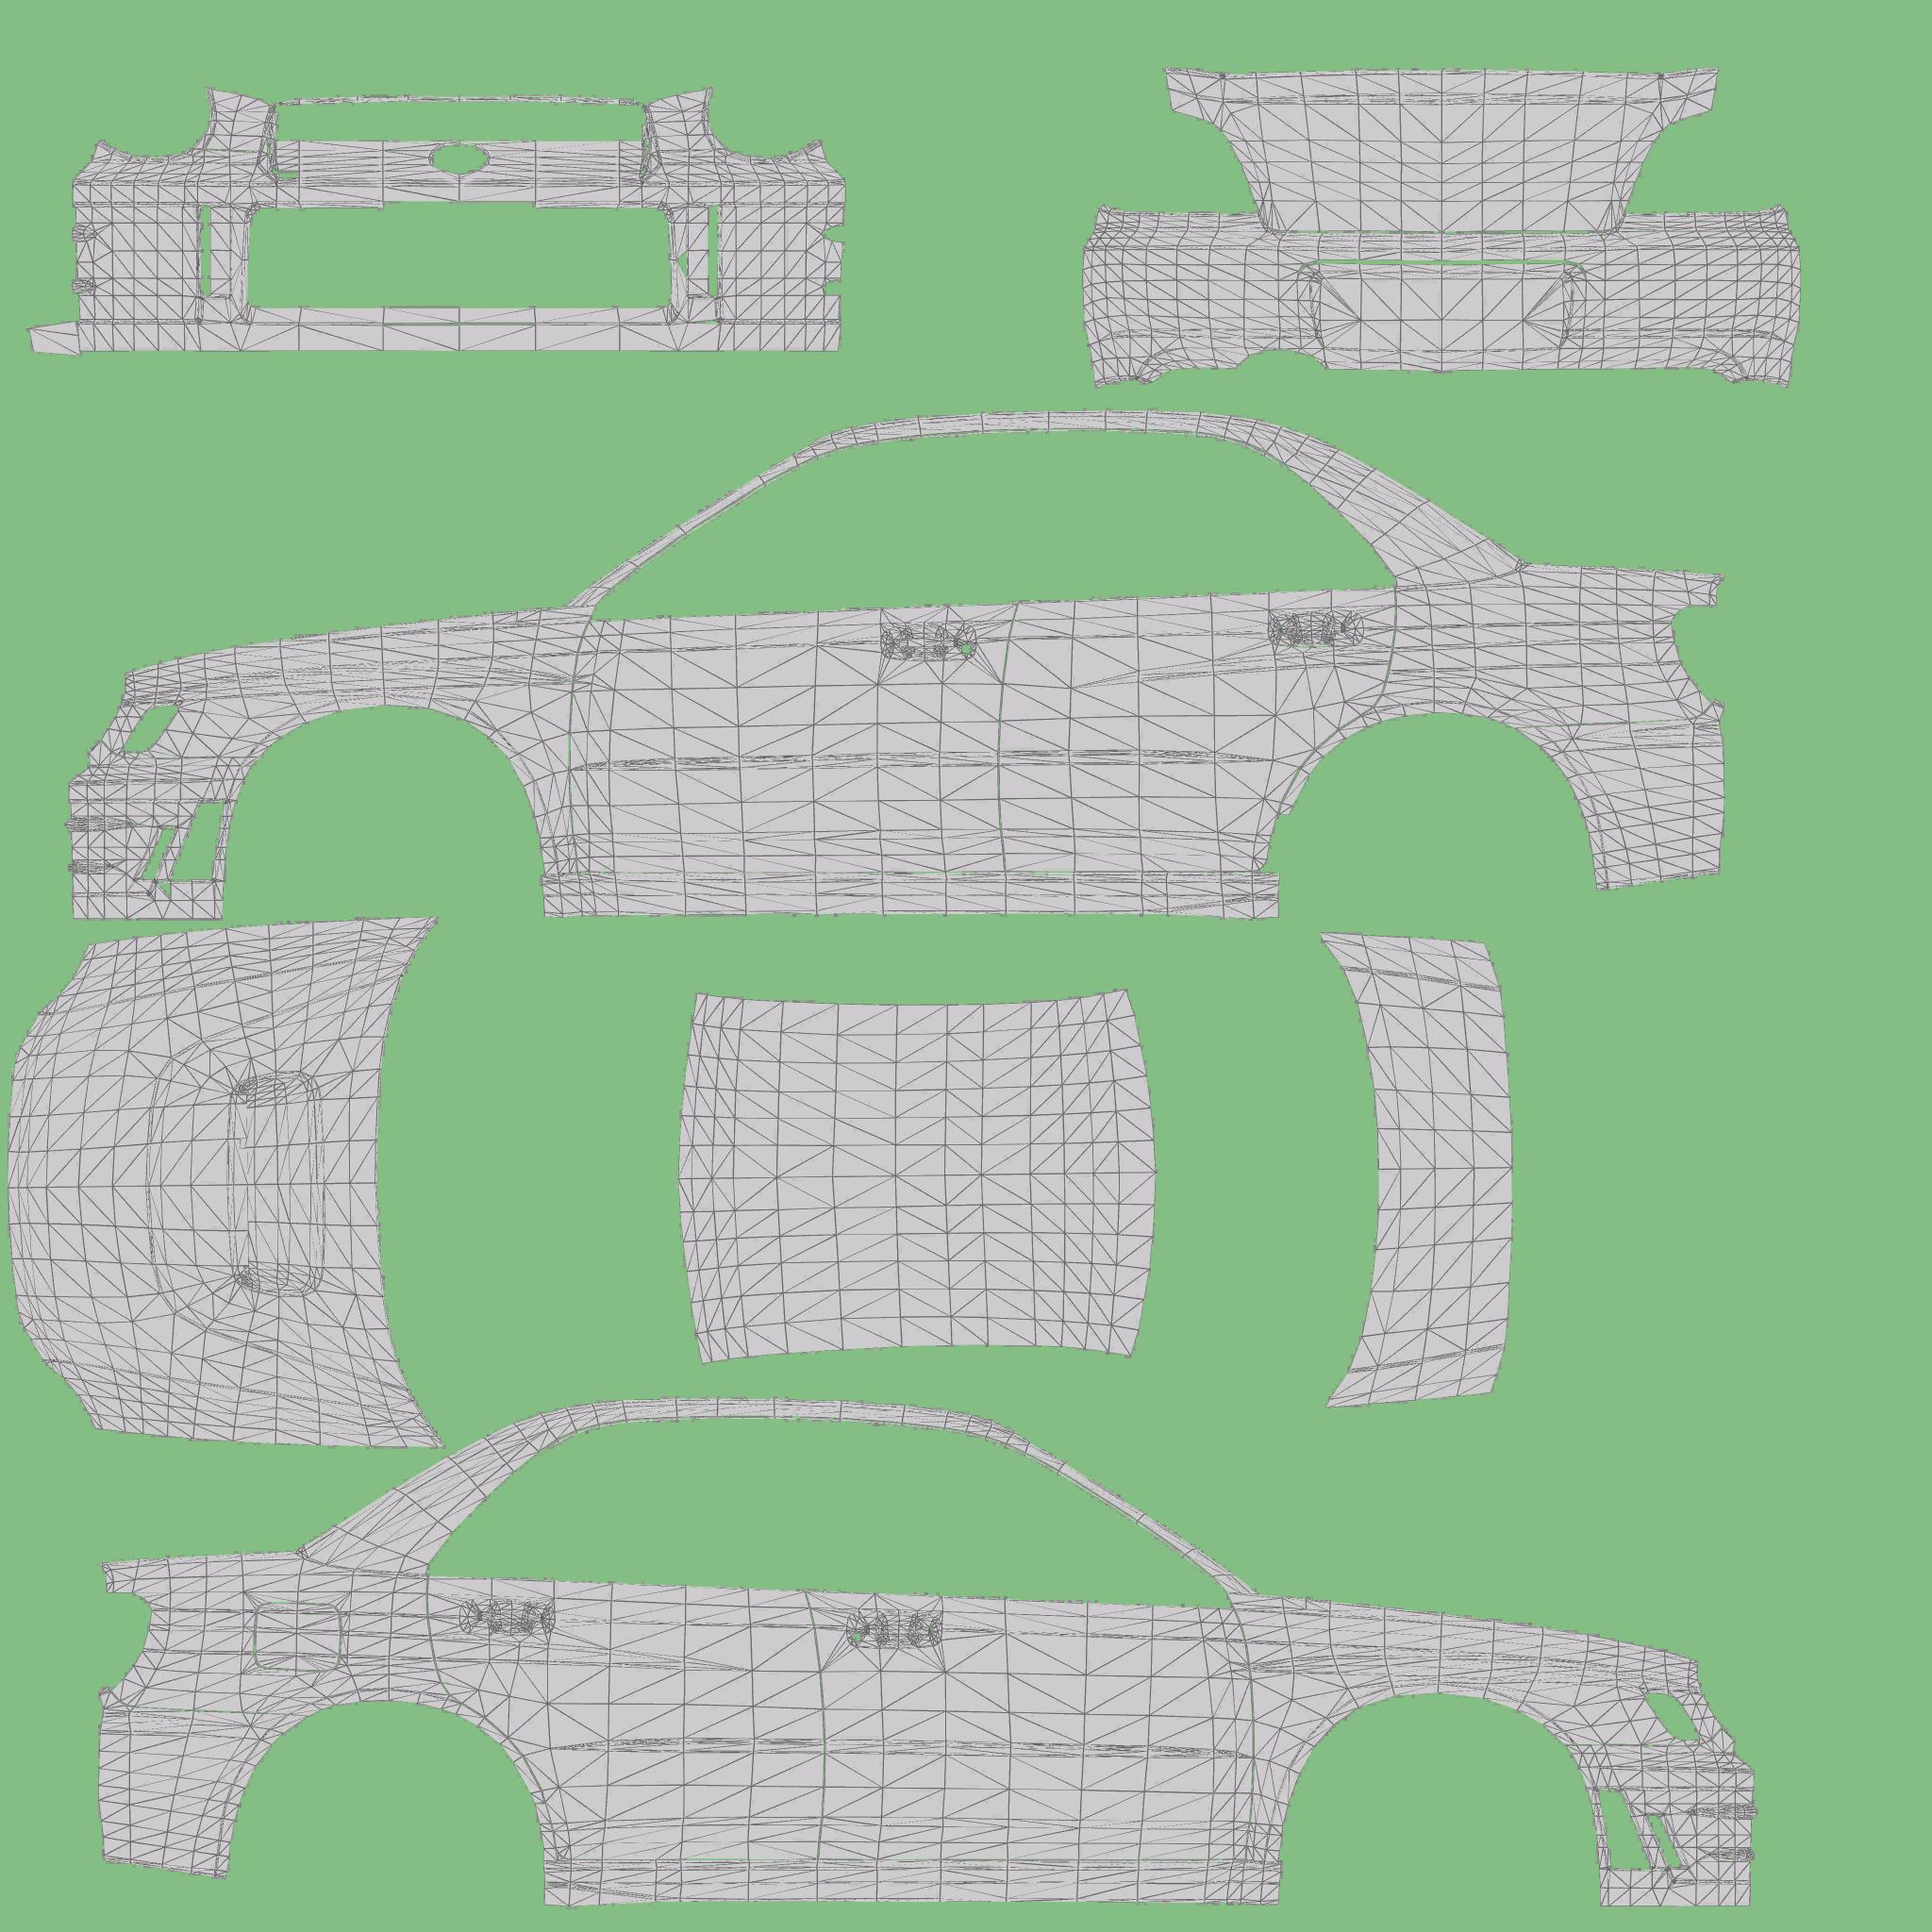 Subaru Impreza WRX 02 WRC Kit [Addon Replace] [Template] GTA5